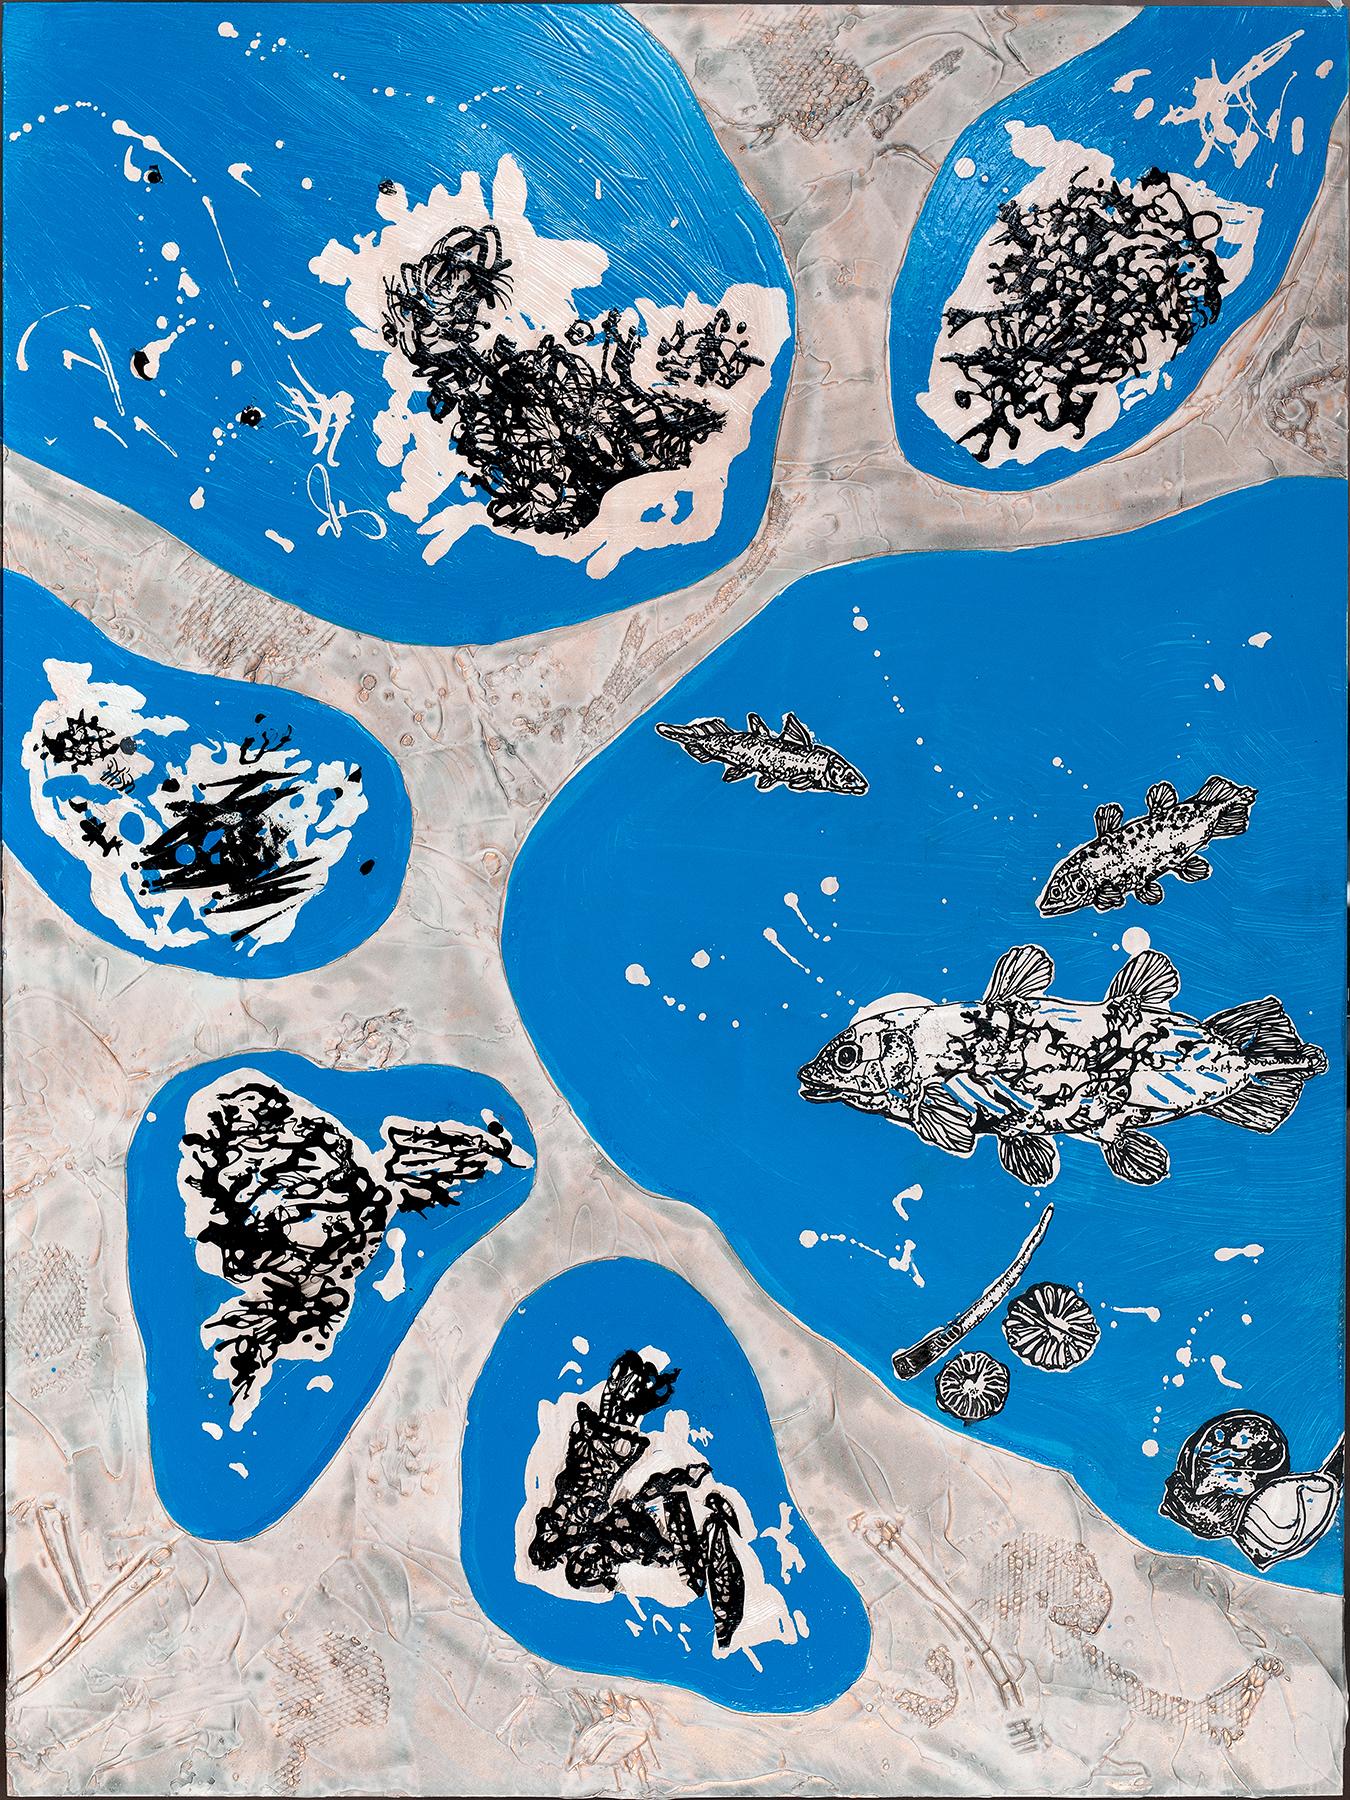 Triassic Pool Remains,  acrylic on panel, 24x18